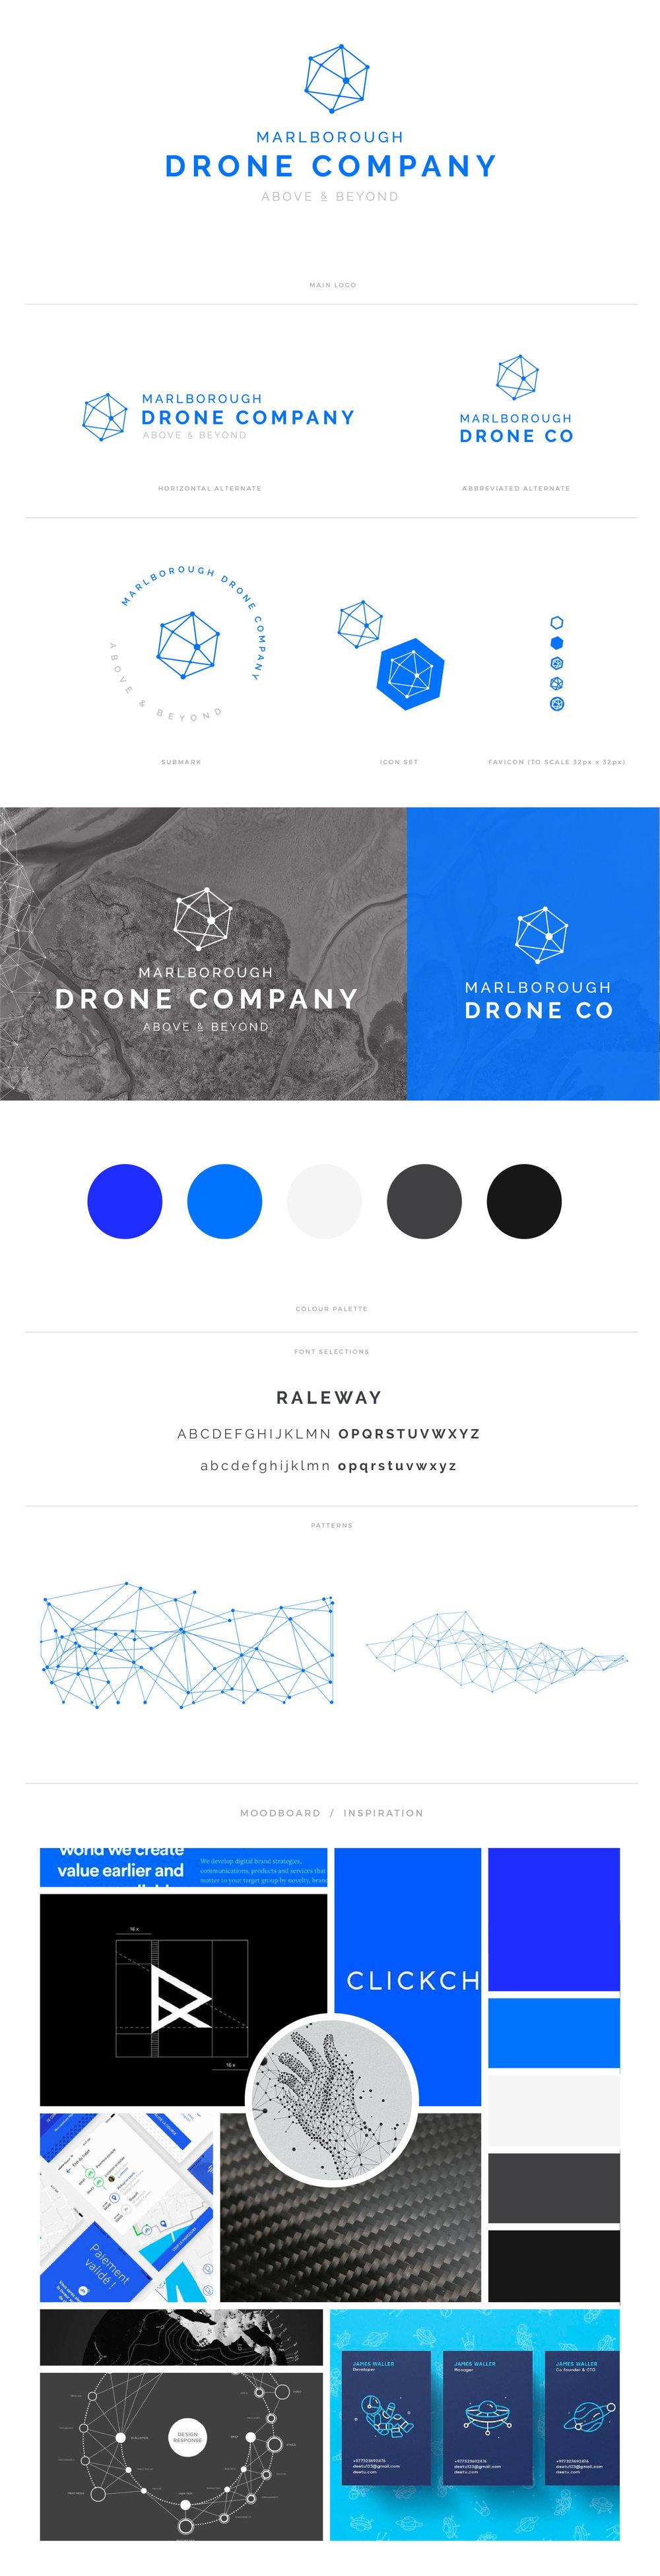 Marlborough Drone Company Brandboard.